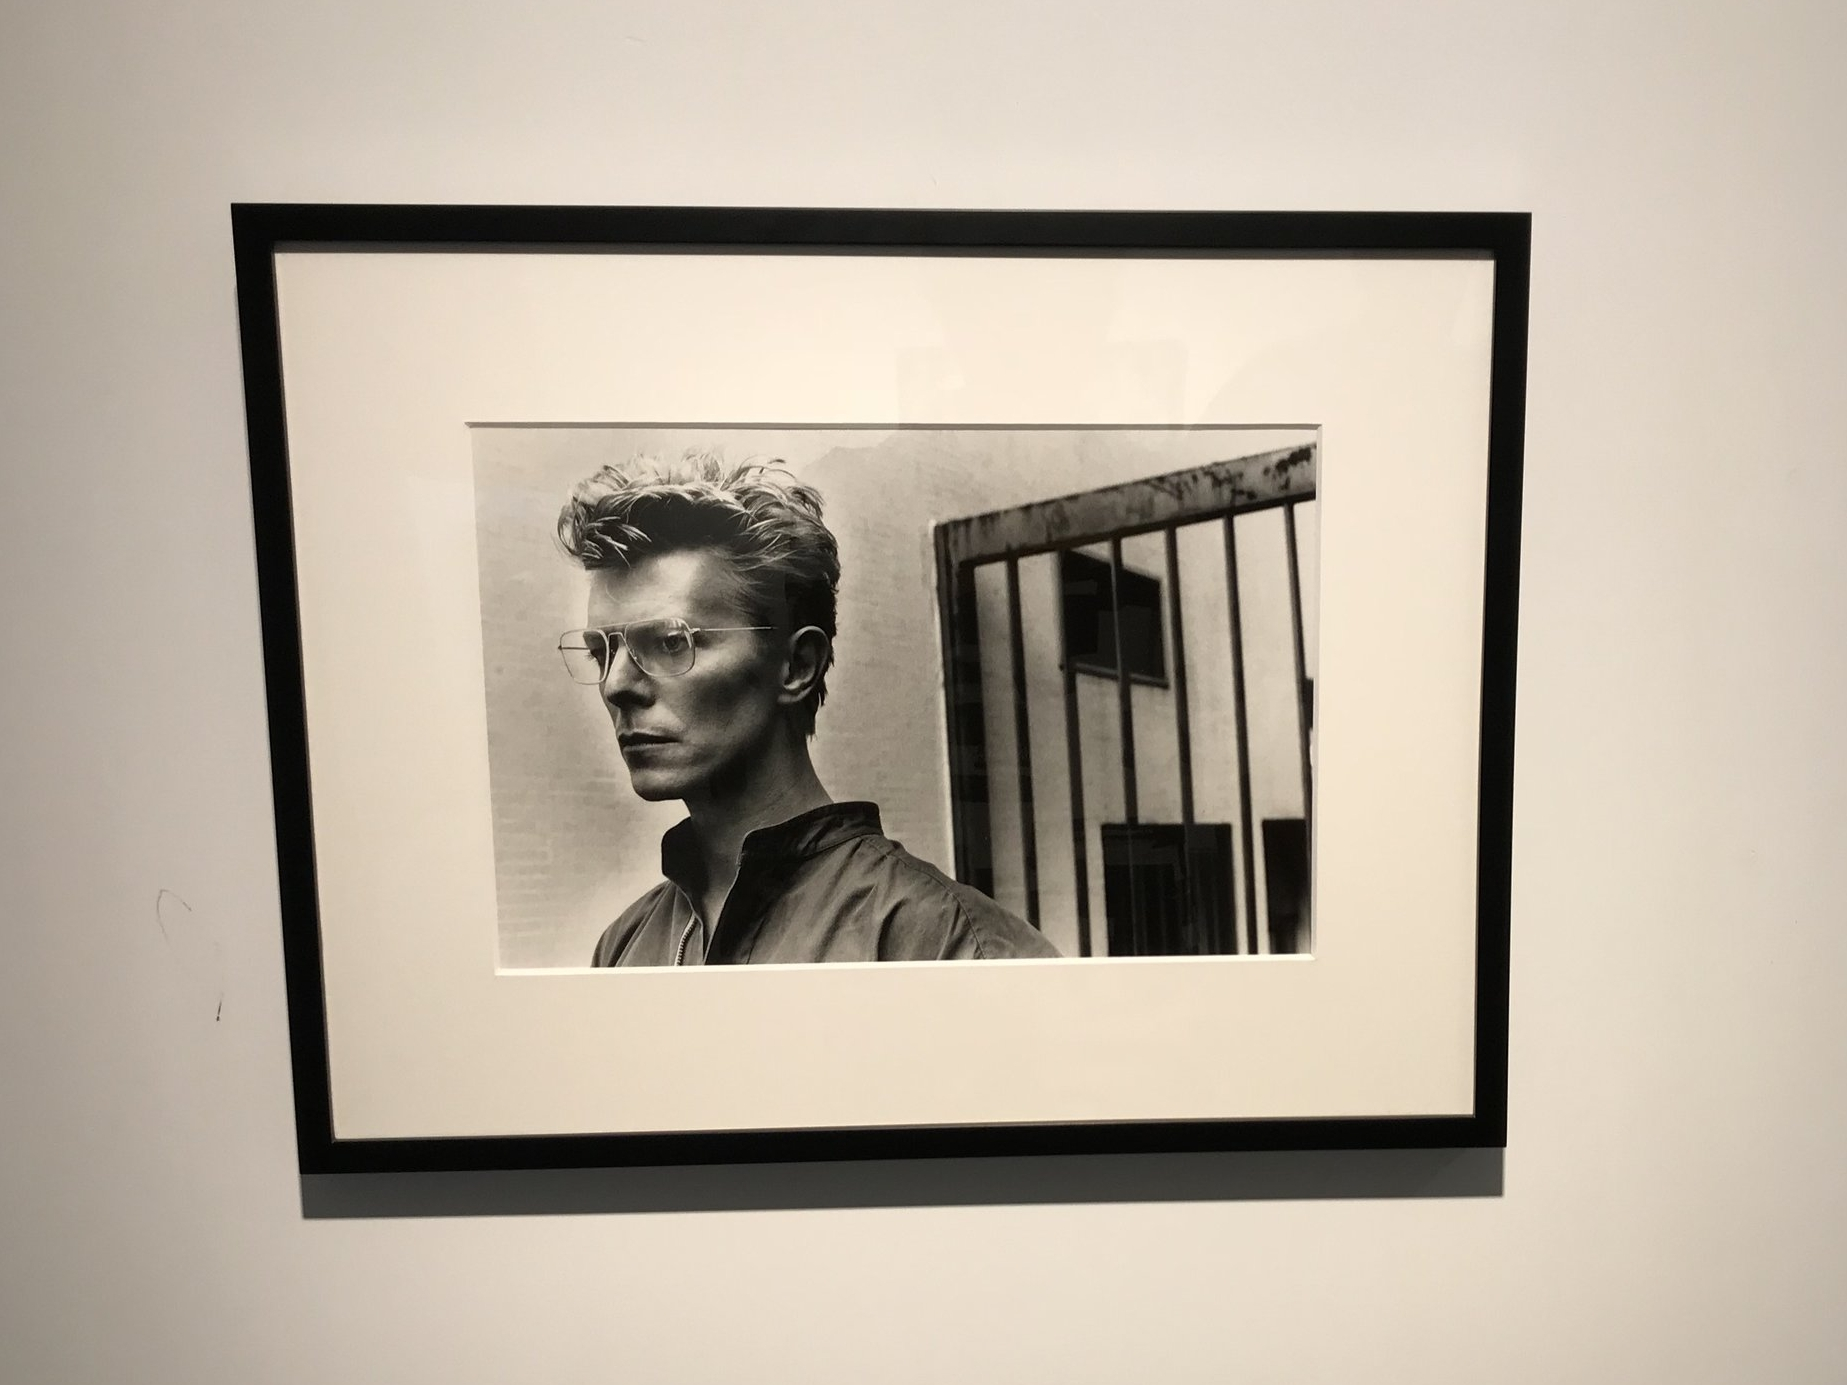 ©Helmut Newton  Private Property, Suite II, 25 David Bowie, Monte Carlo, Gelatin Silver Print, 6/75, 30 x 40 cm, 1982